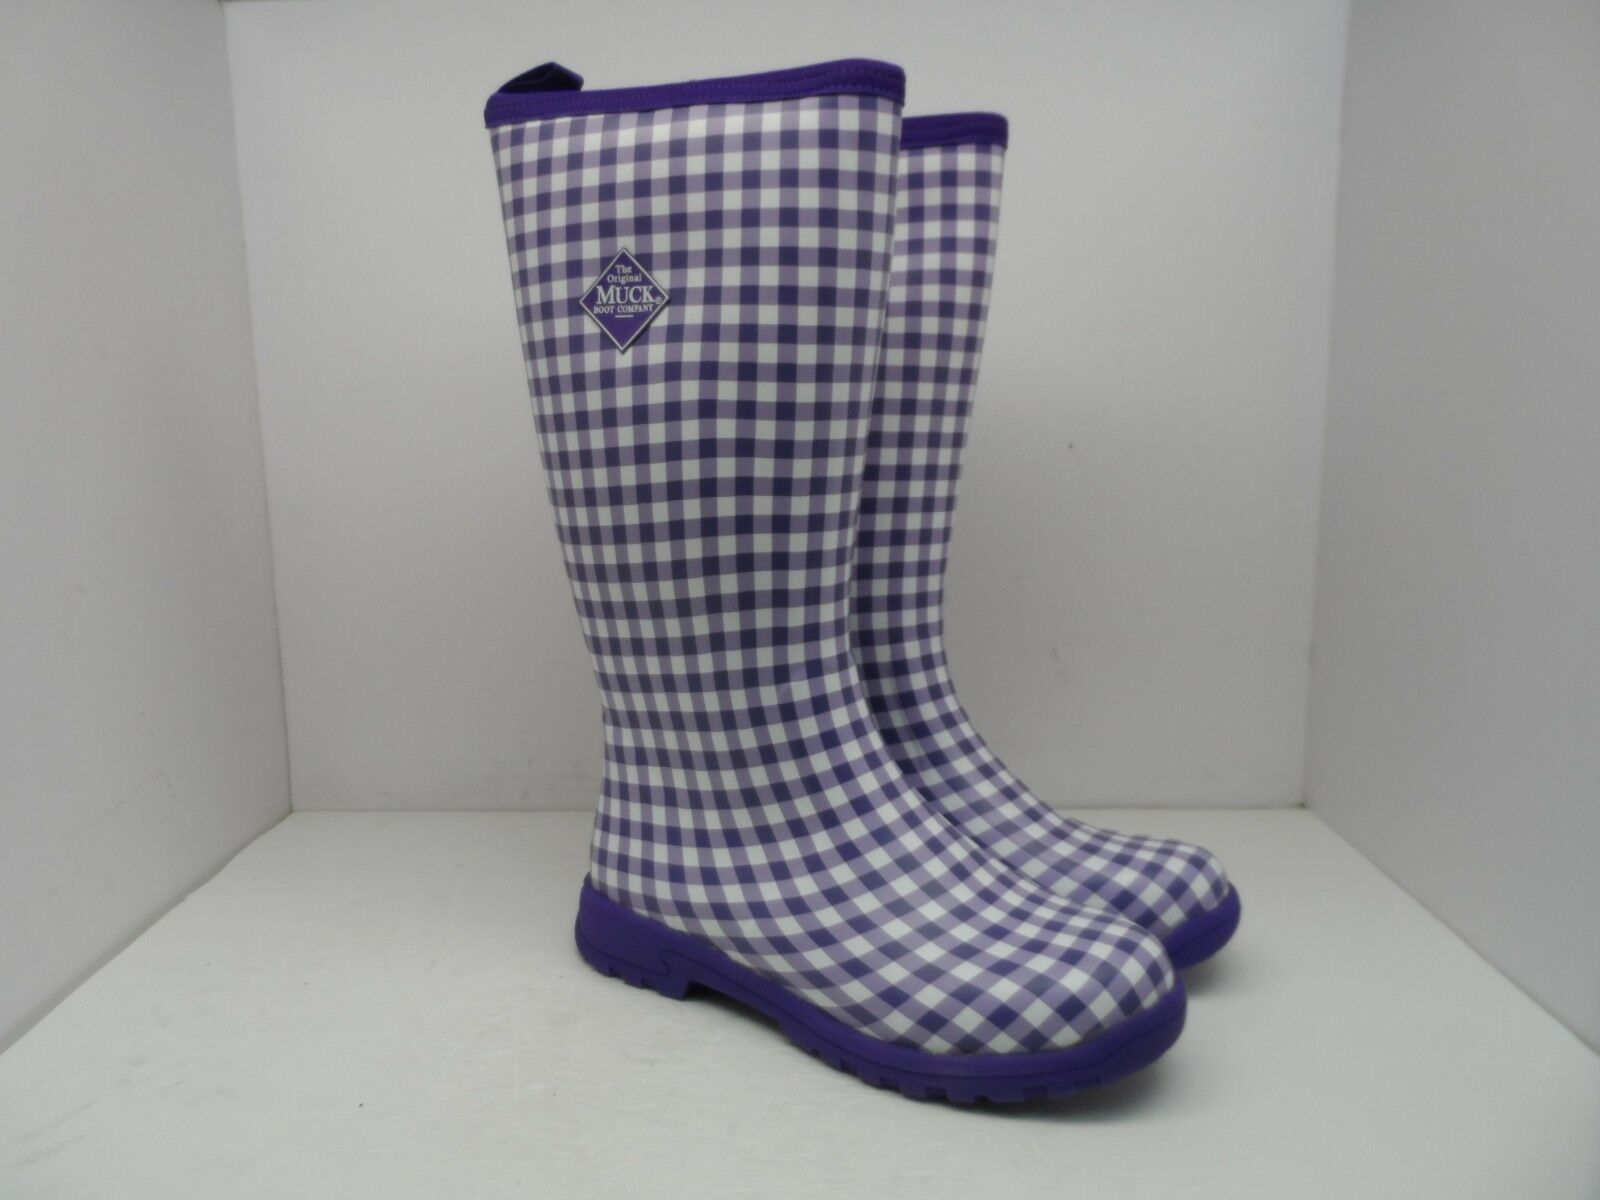 Muck botas para Mujer Breezy alto aislado para Lluvia Lluvia Lluvia botas BZT-5GHM Púrpura Cuadros 10M  garantía de crédito